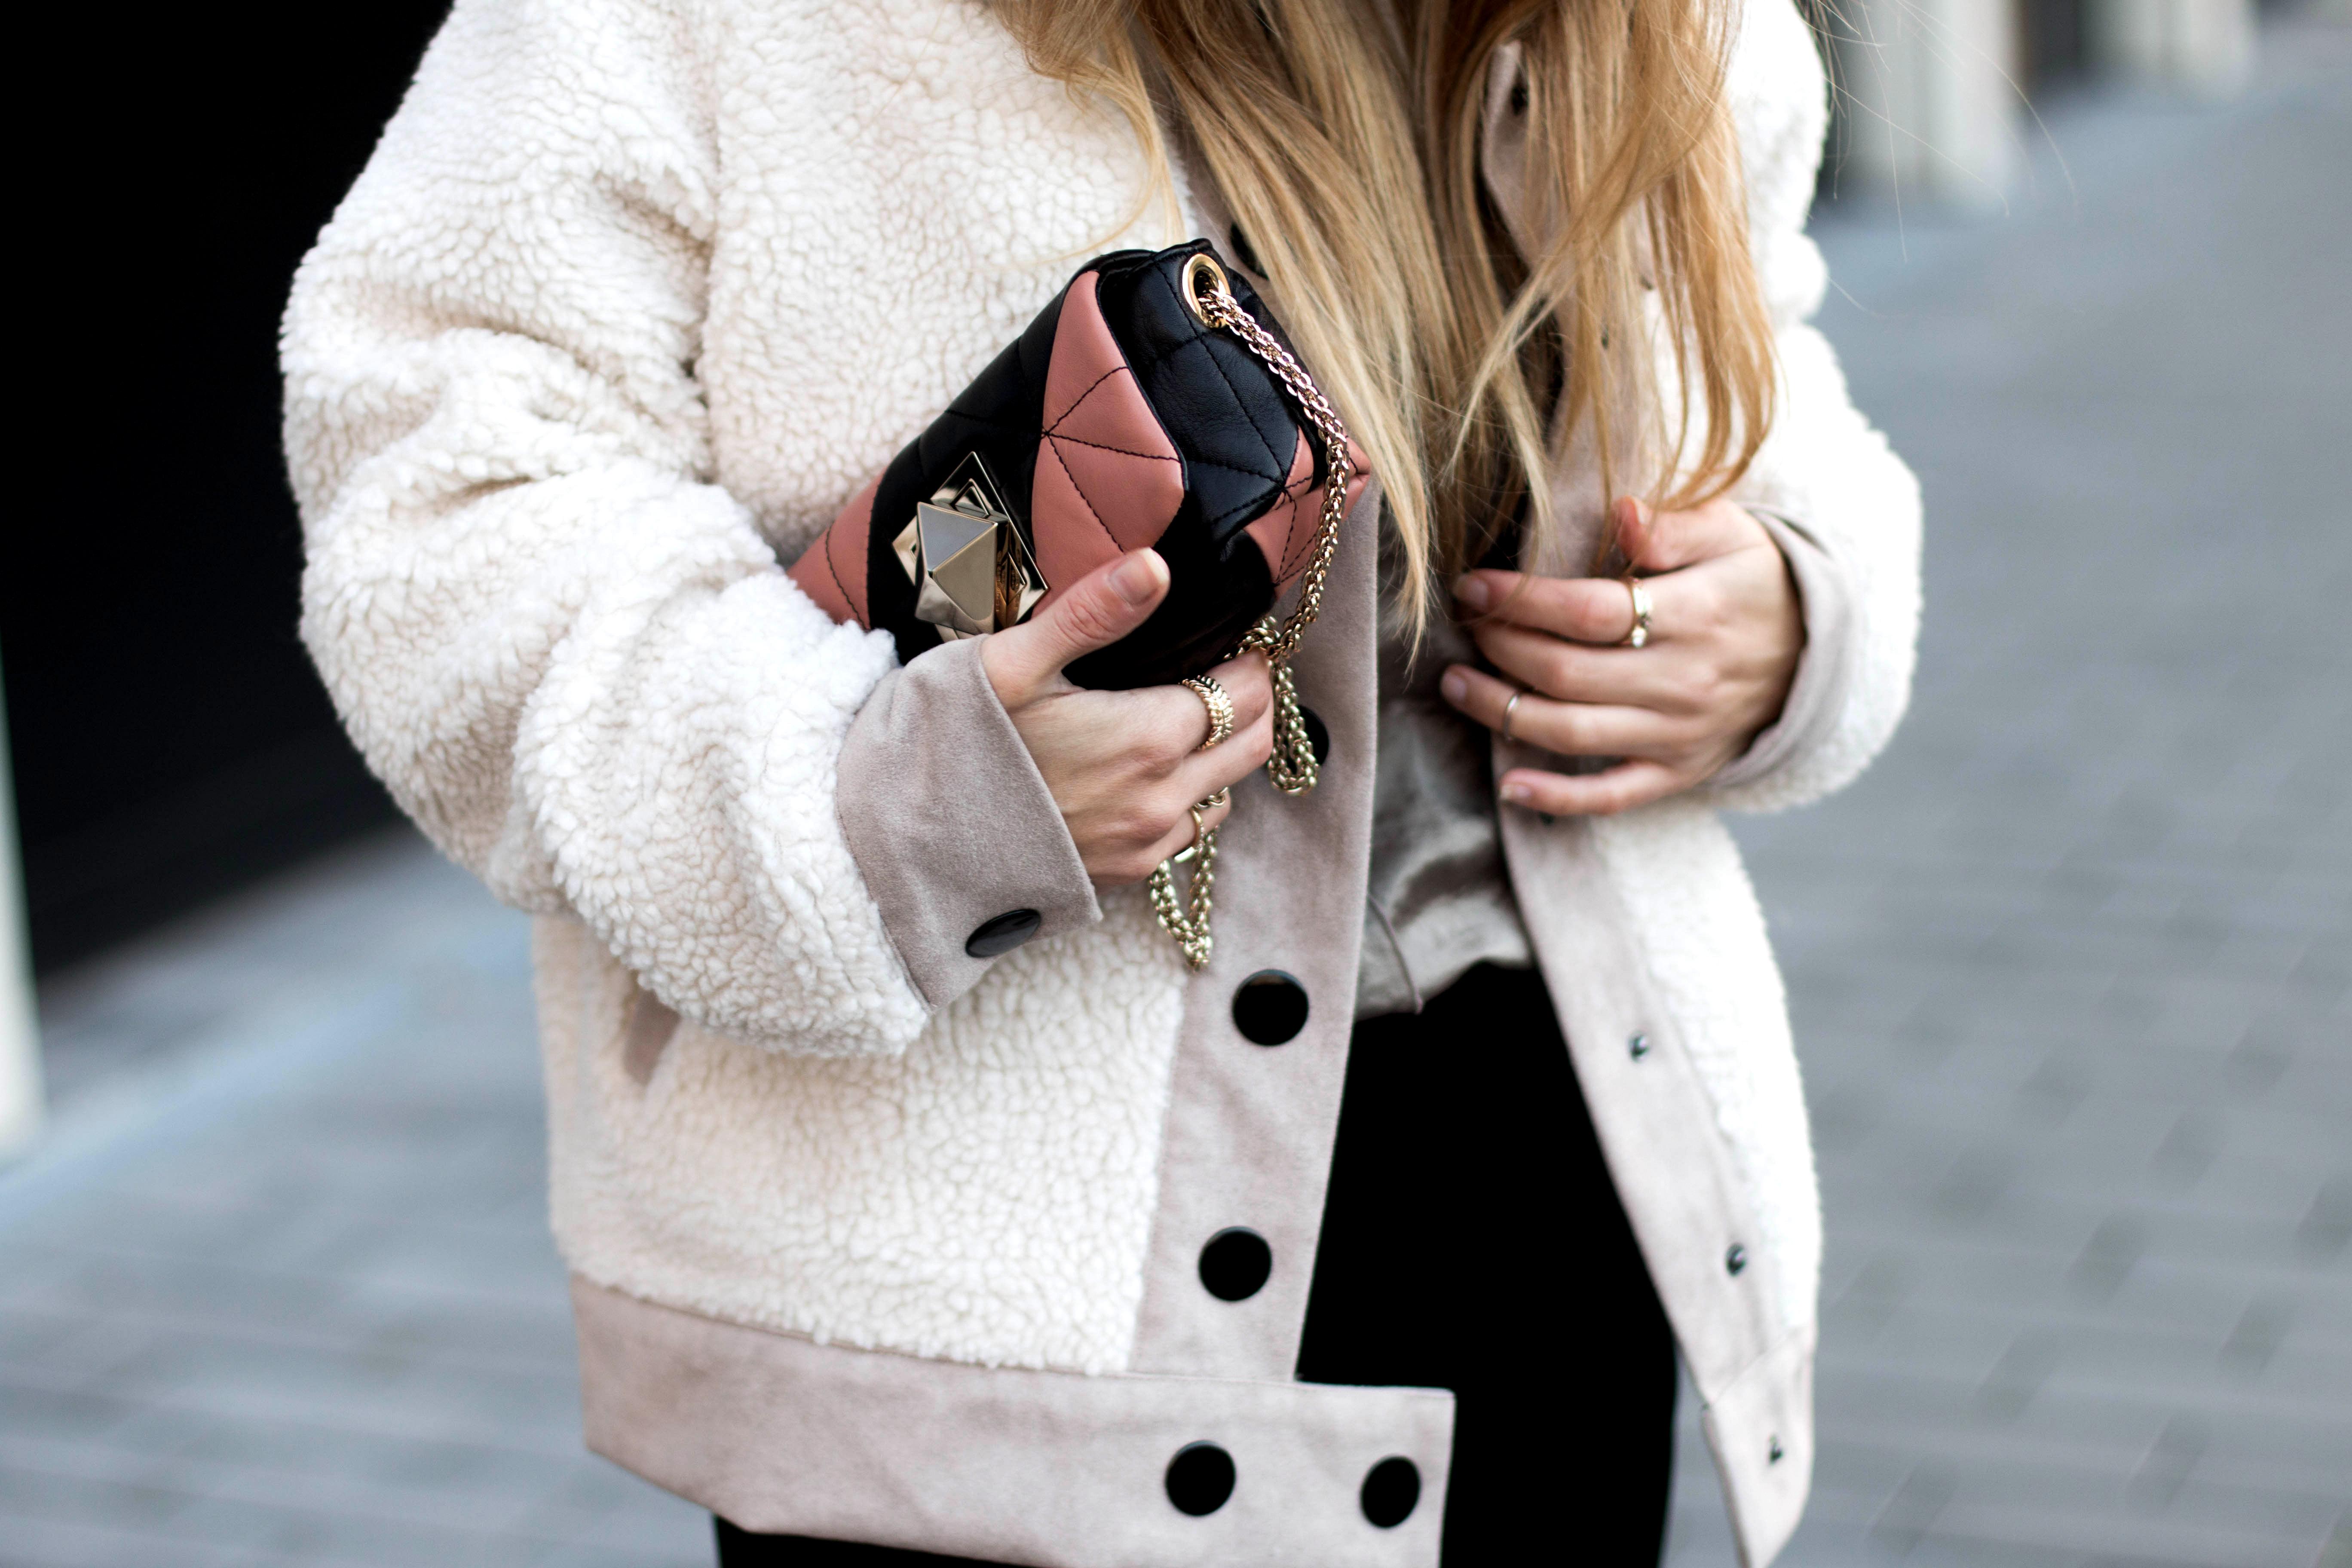 zara-teddy-shearling-jacket-fw-16-streetstyle-monnier-freres-sonia-rykiel-bag-le-copain-quilted-bag